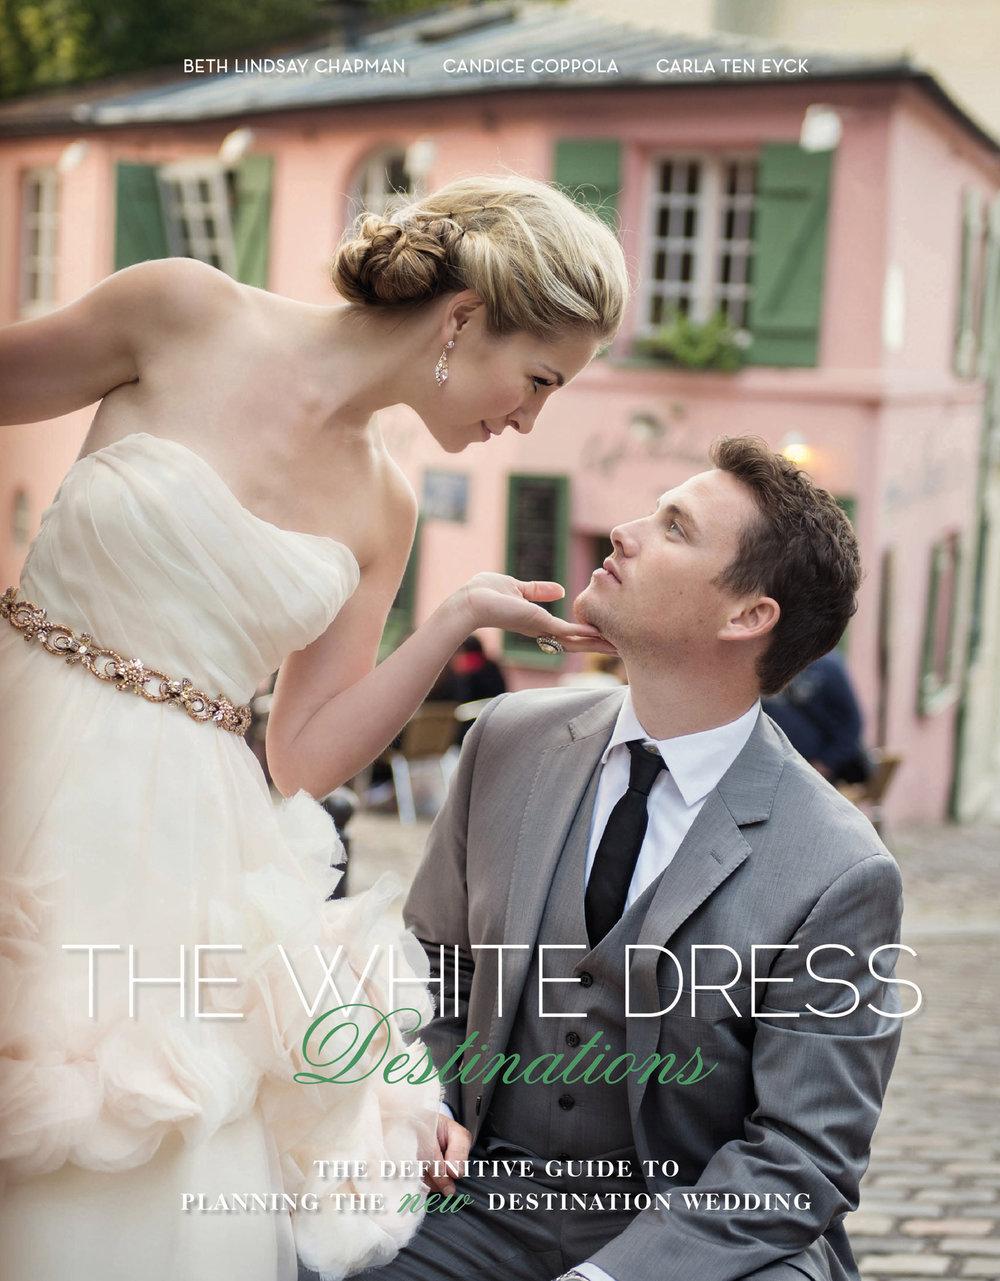 bridefriends-guide-to-destination-weddings-podcast-the-white-dress-destinations-book-episode-21-0.jpg